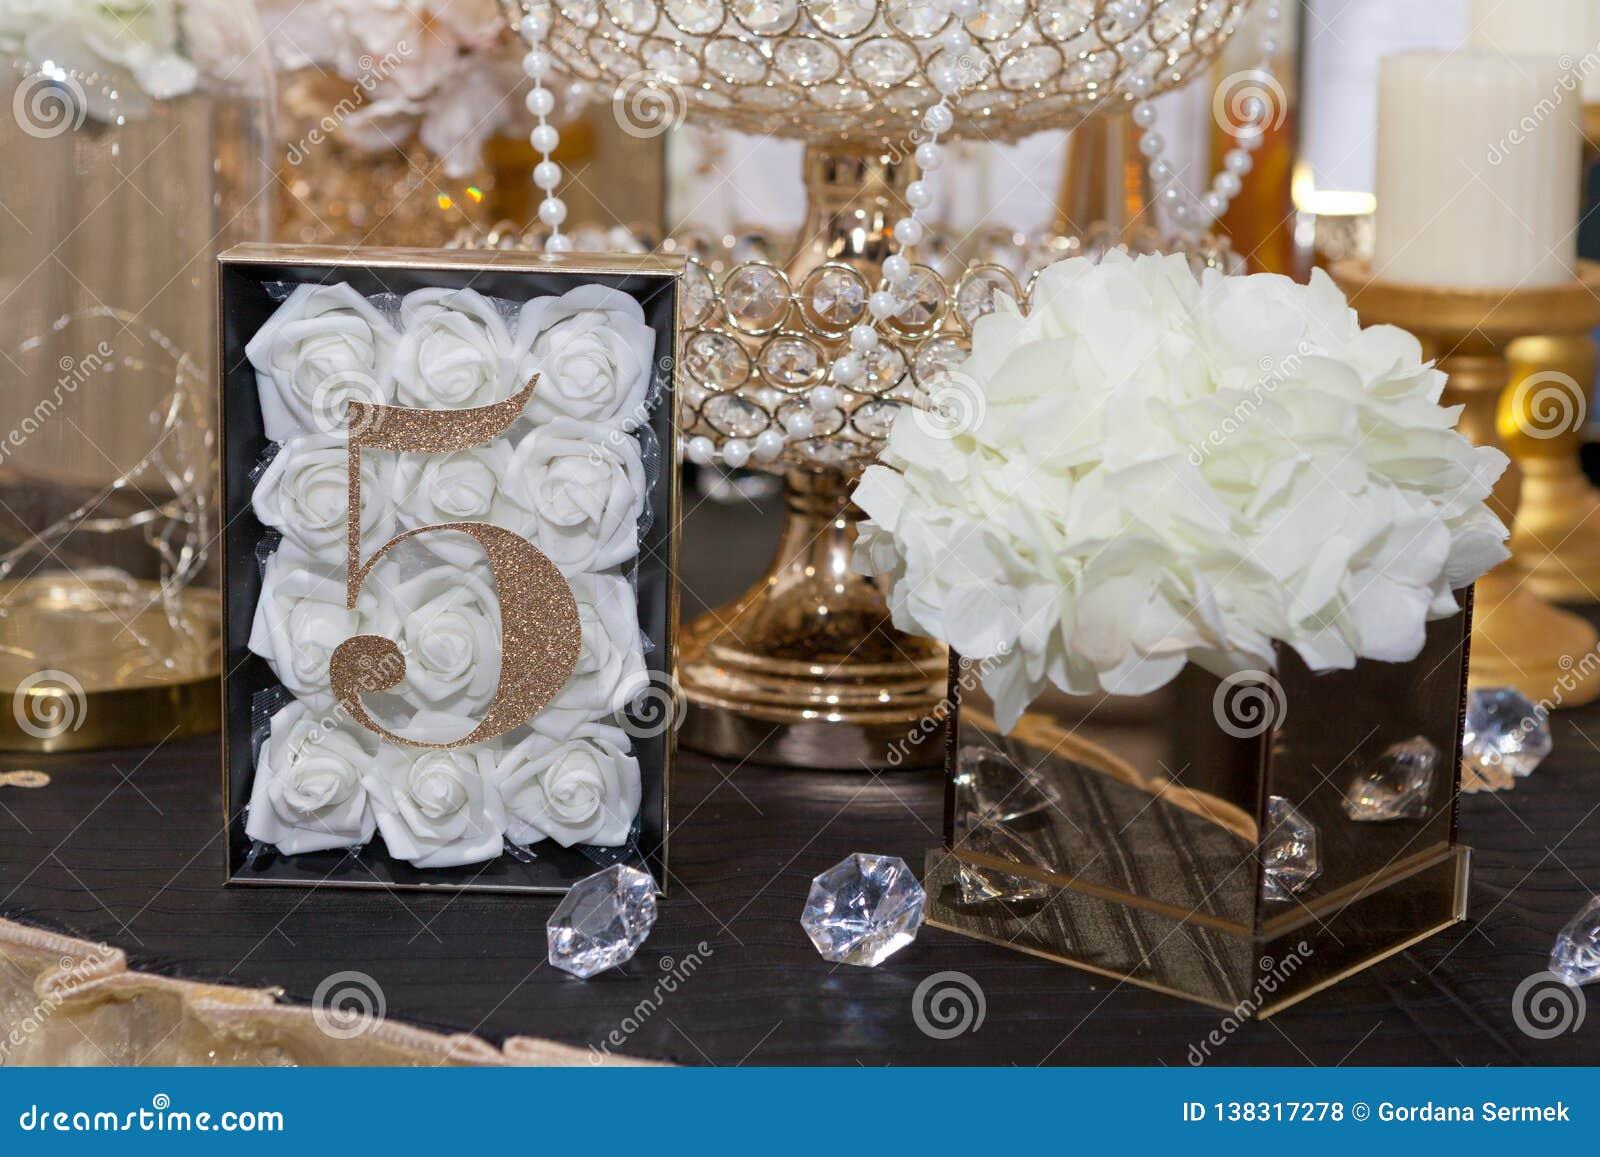 Cinco na tabela para convidados no jantar de casamento